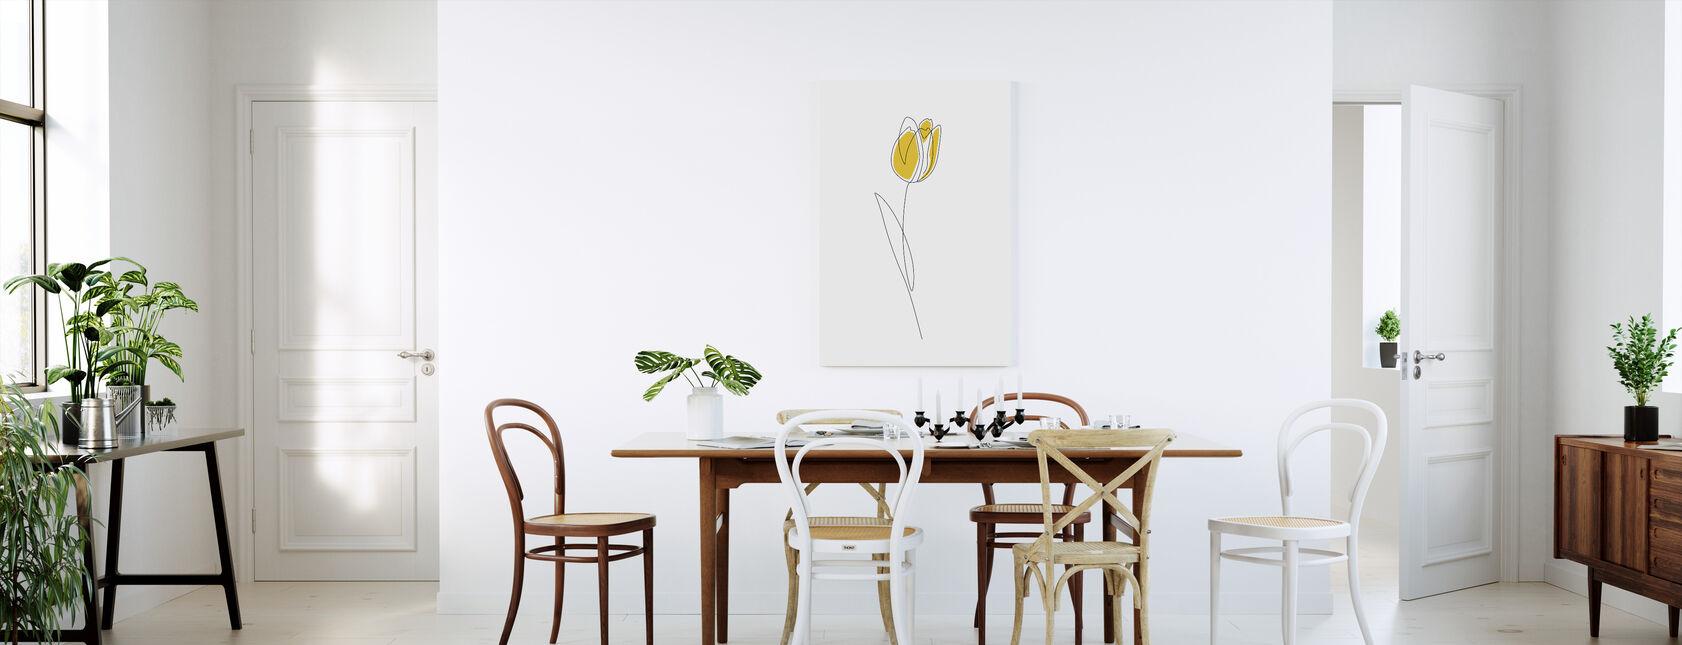 Spring Tulips - Canvas print - Kitchen